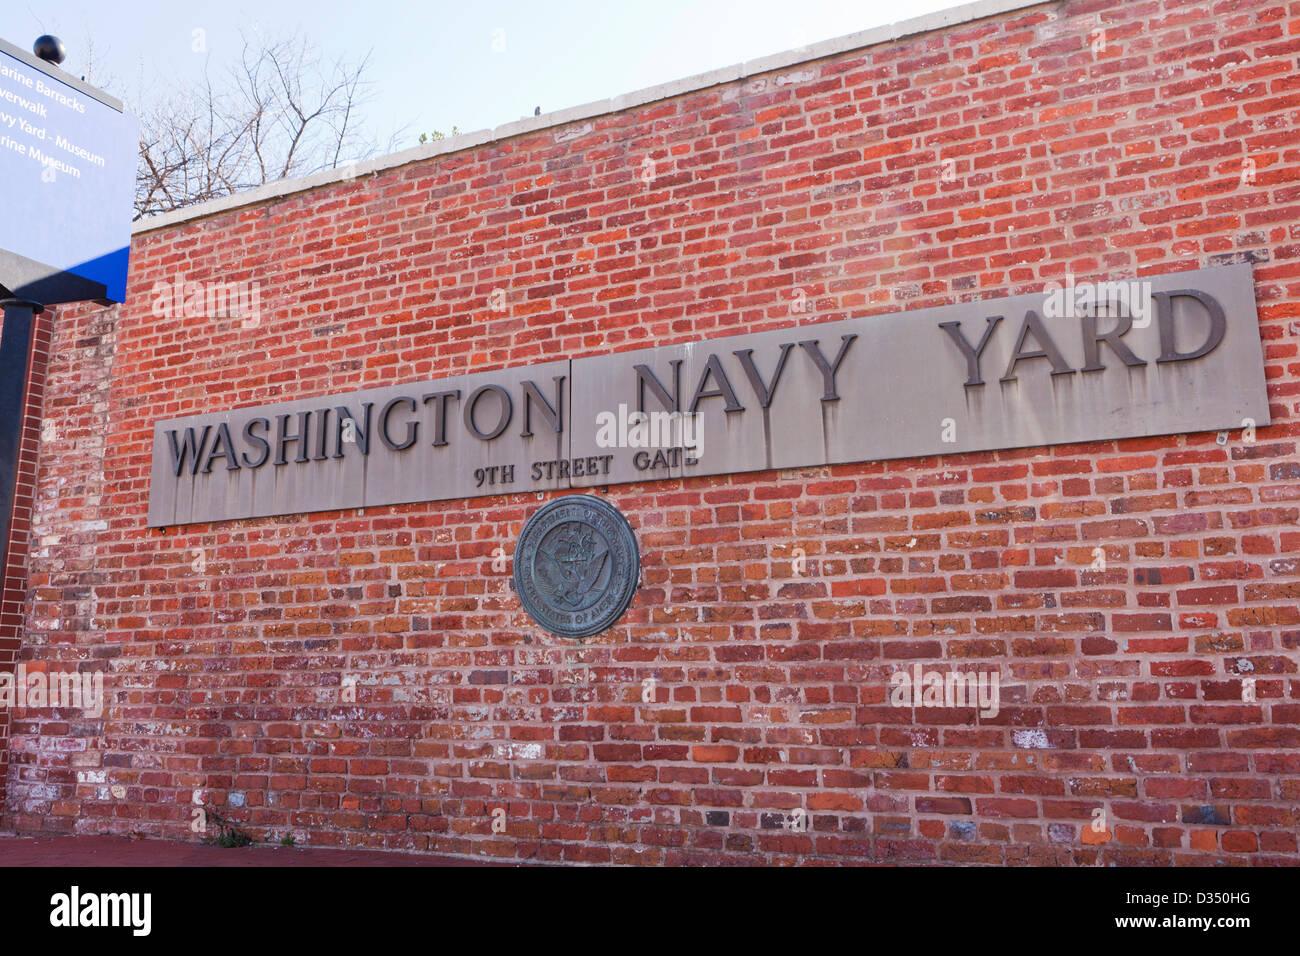 Washington Navy Yard sign Stock Photo